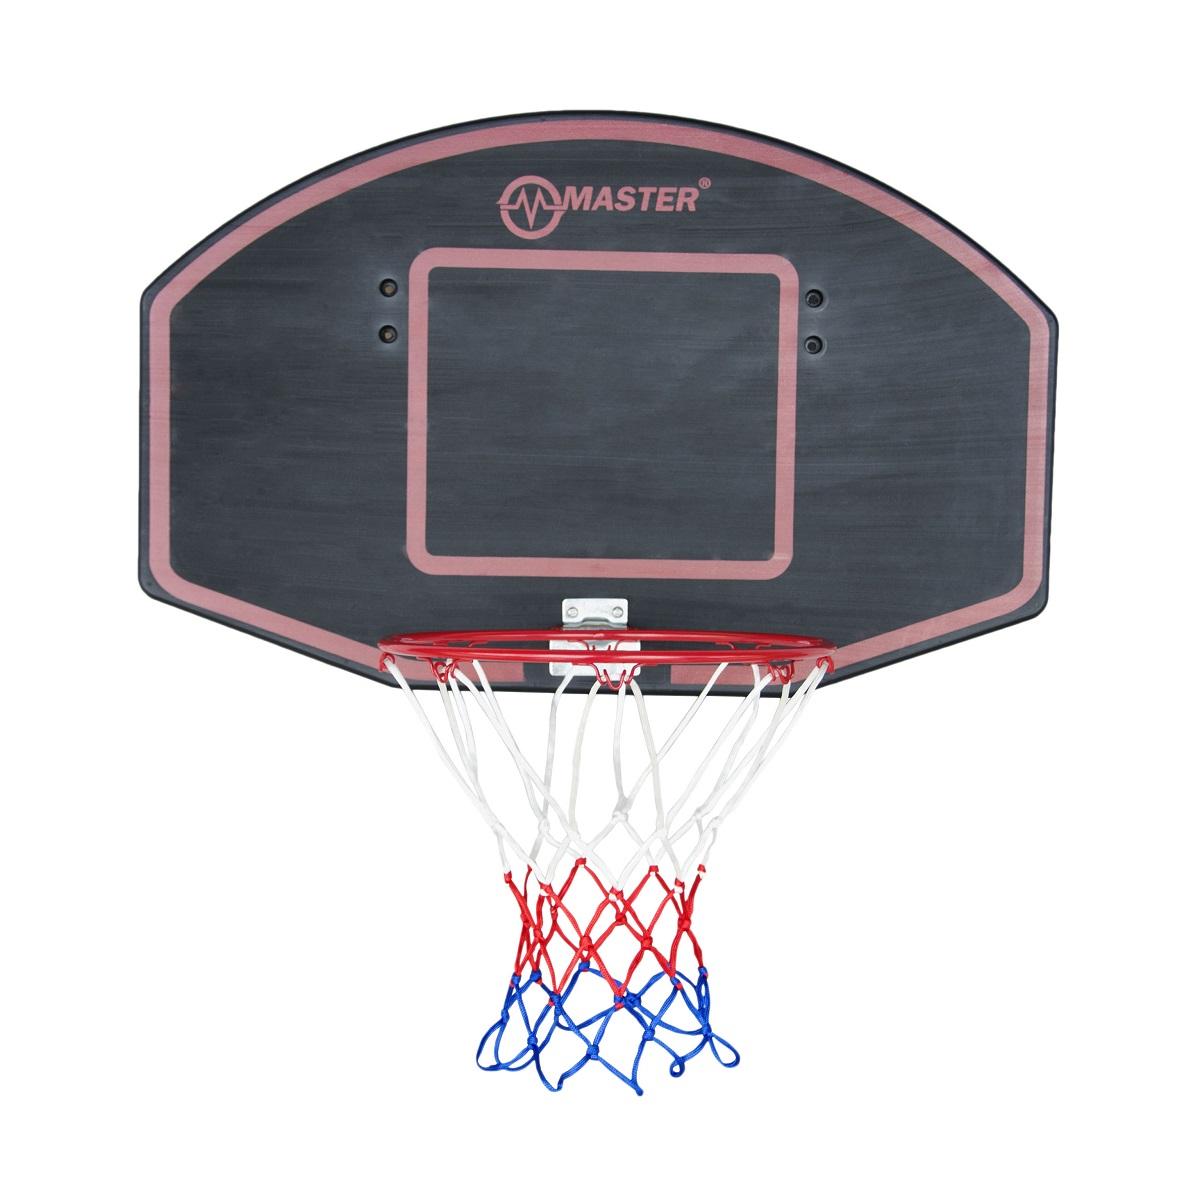 Basketbalový koš s deskou MASTER 71 x 45 cm - černý